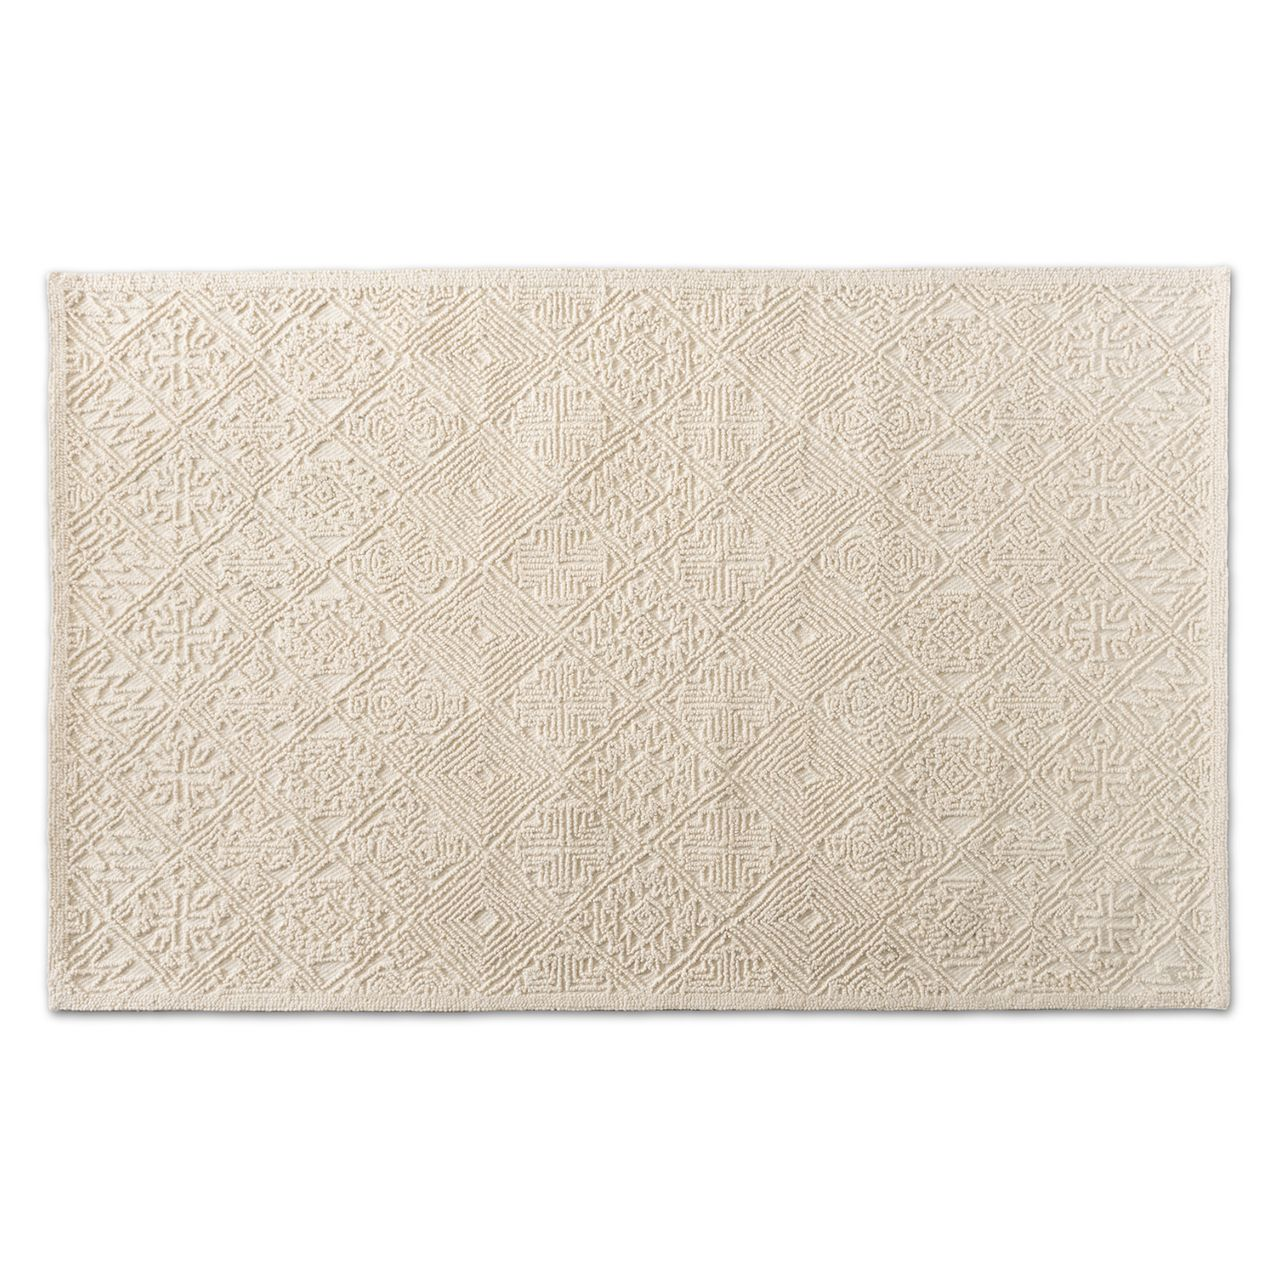 Baxton Studio Meltem Ivory Handwoven Wool Area Rug